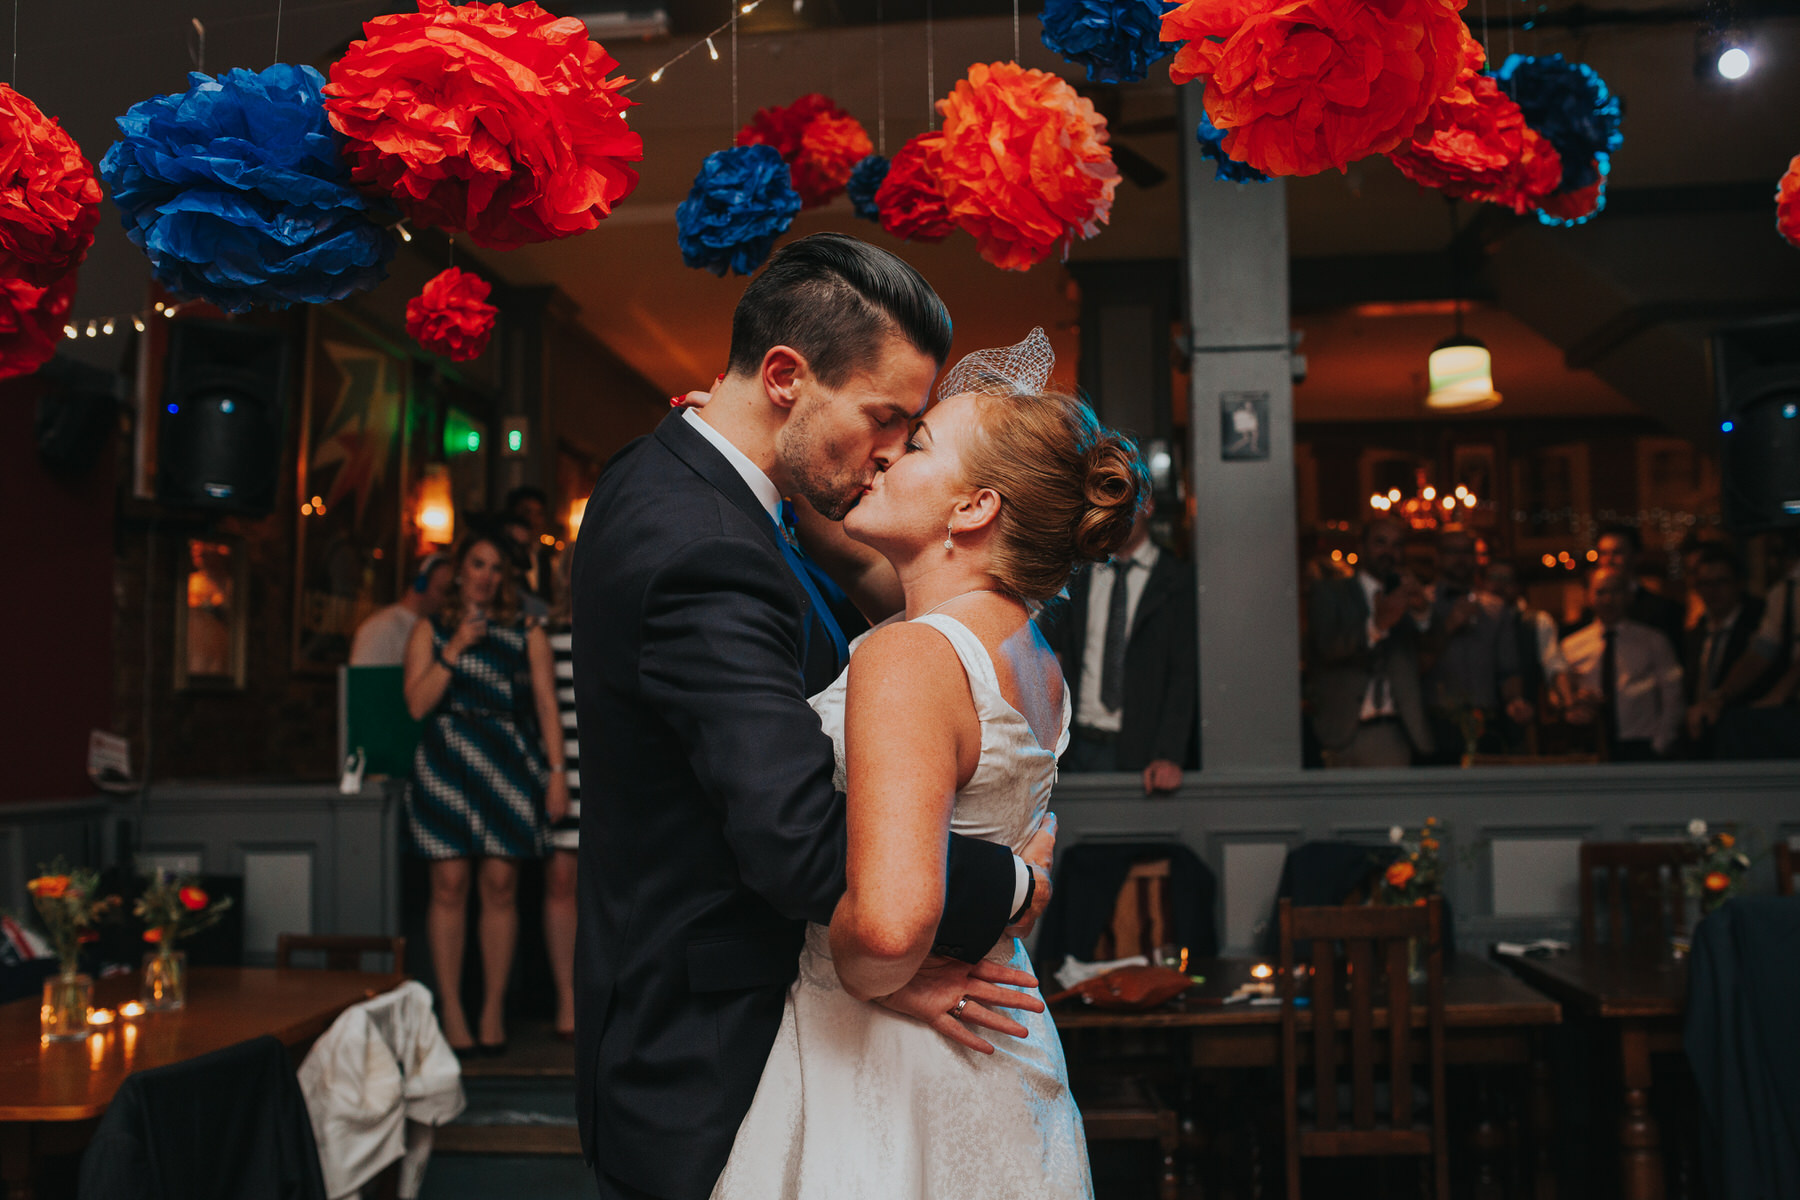 Londesborough-Pub-wedding-first-dance.jpg